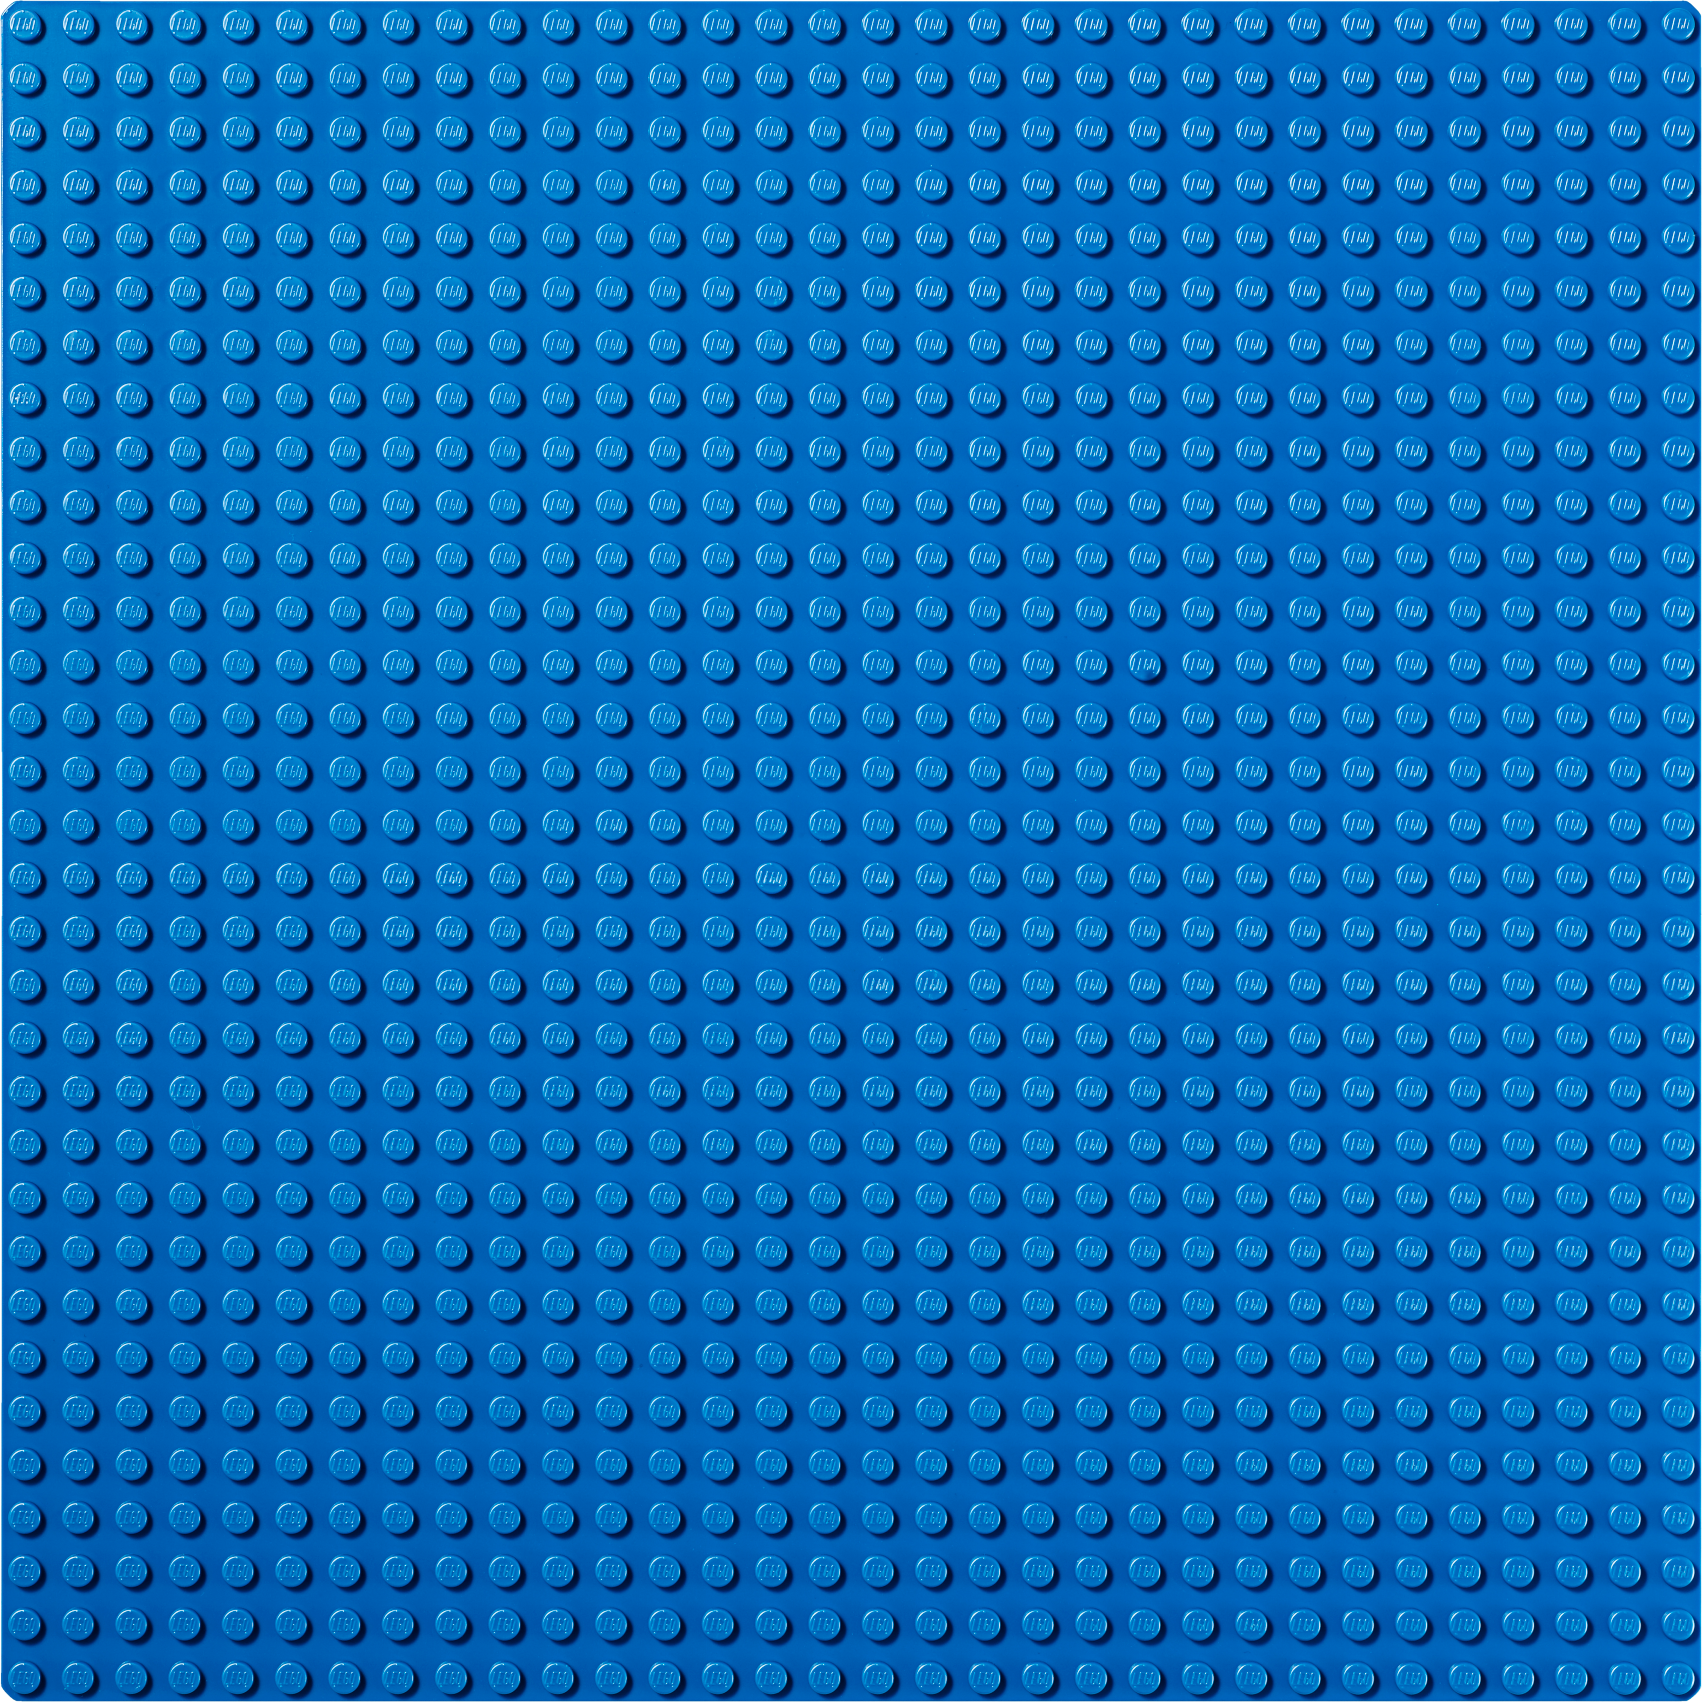 Blue Baseplate